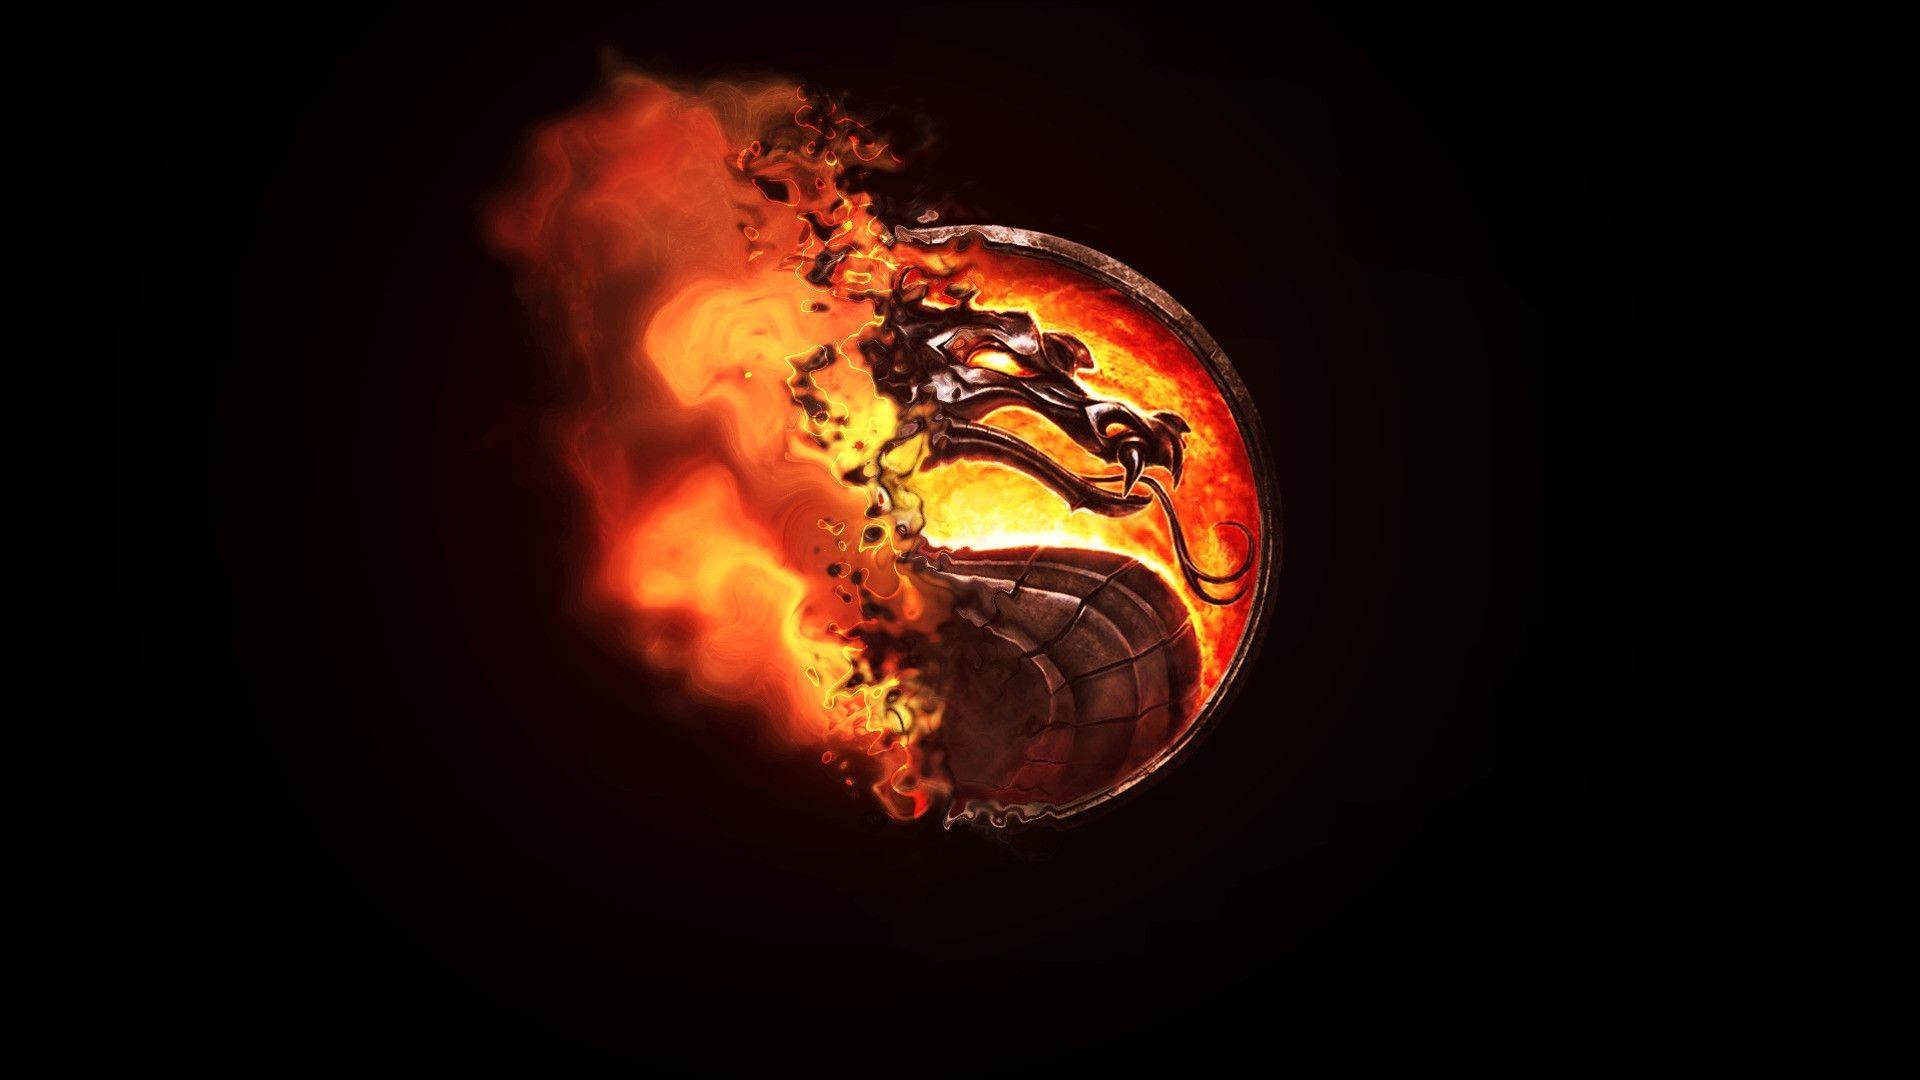 Mortal Kombat Logo Wallpapers (72+ images)